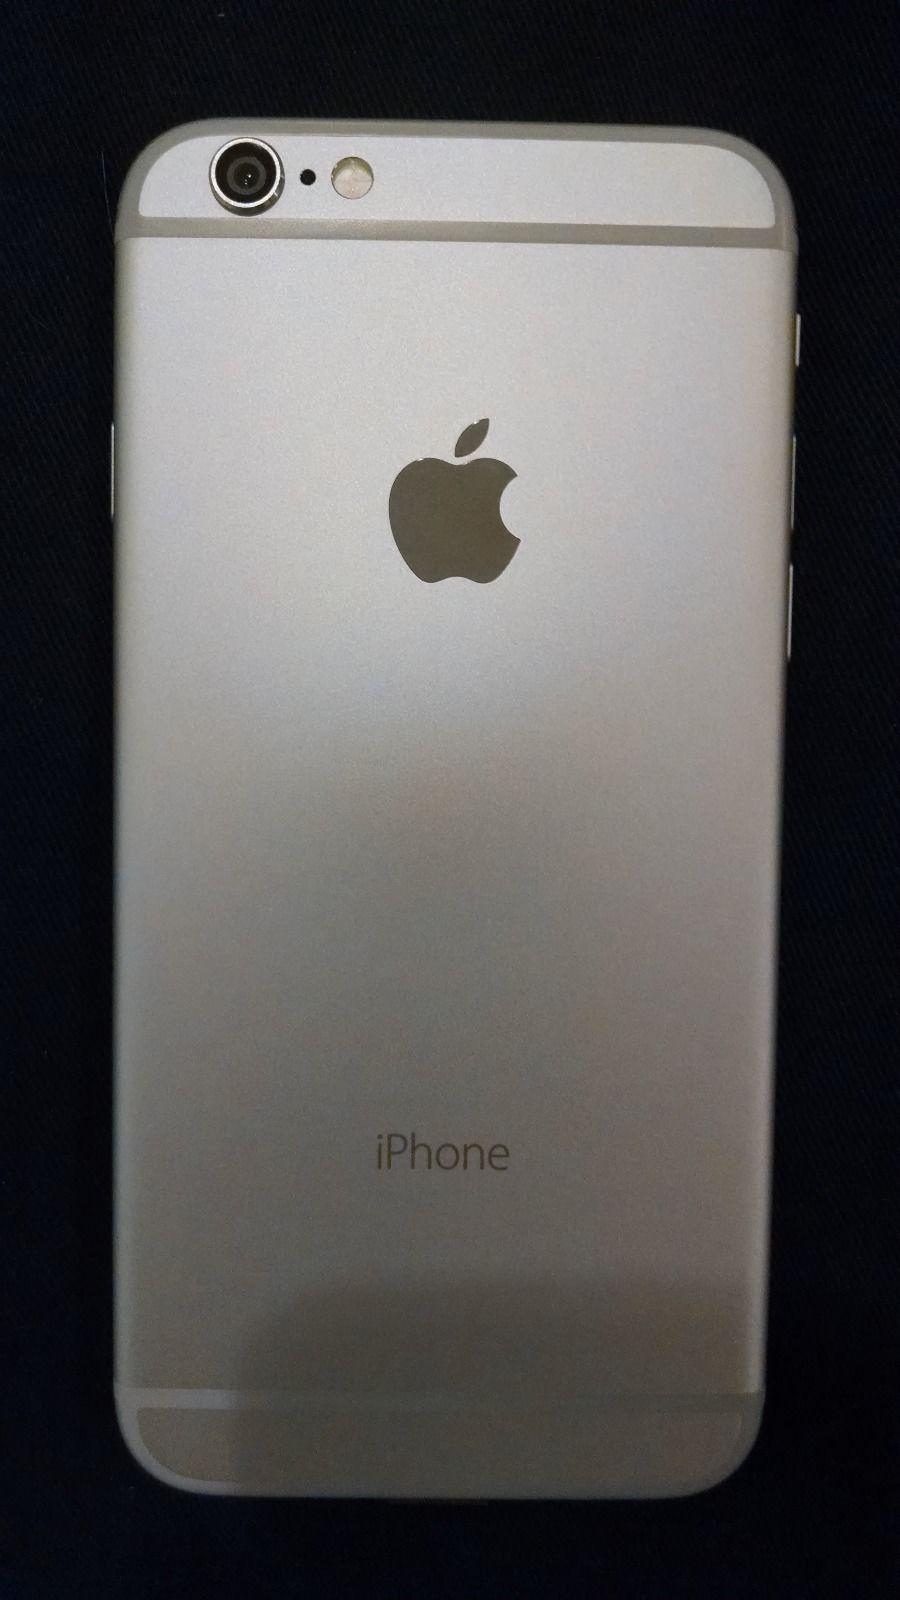 Iphone 6 Prototype Listed For Sale On Ebay Iclarified